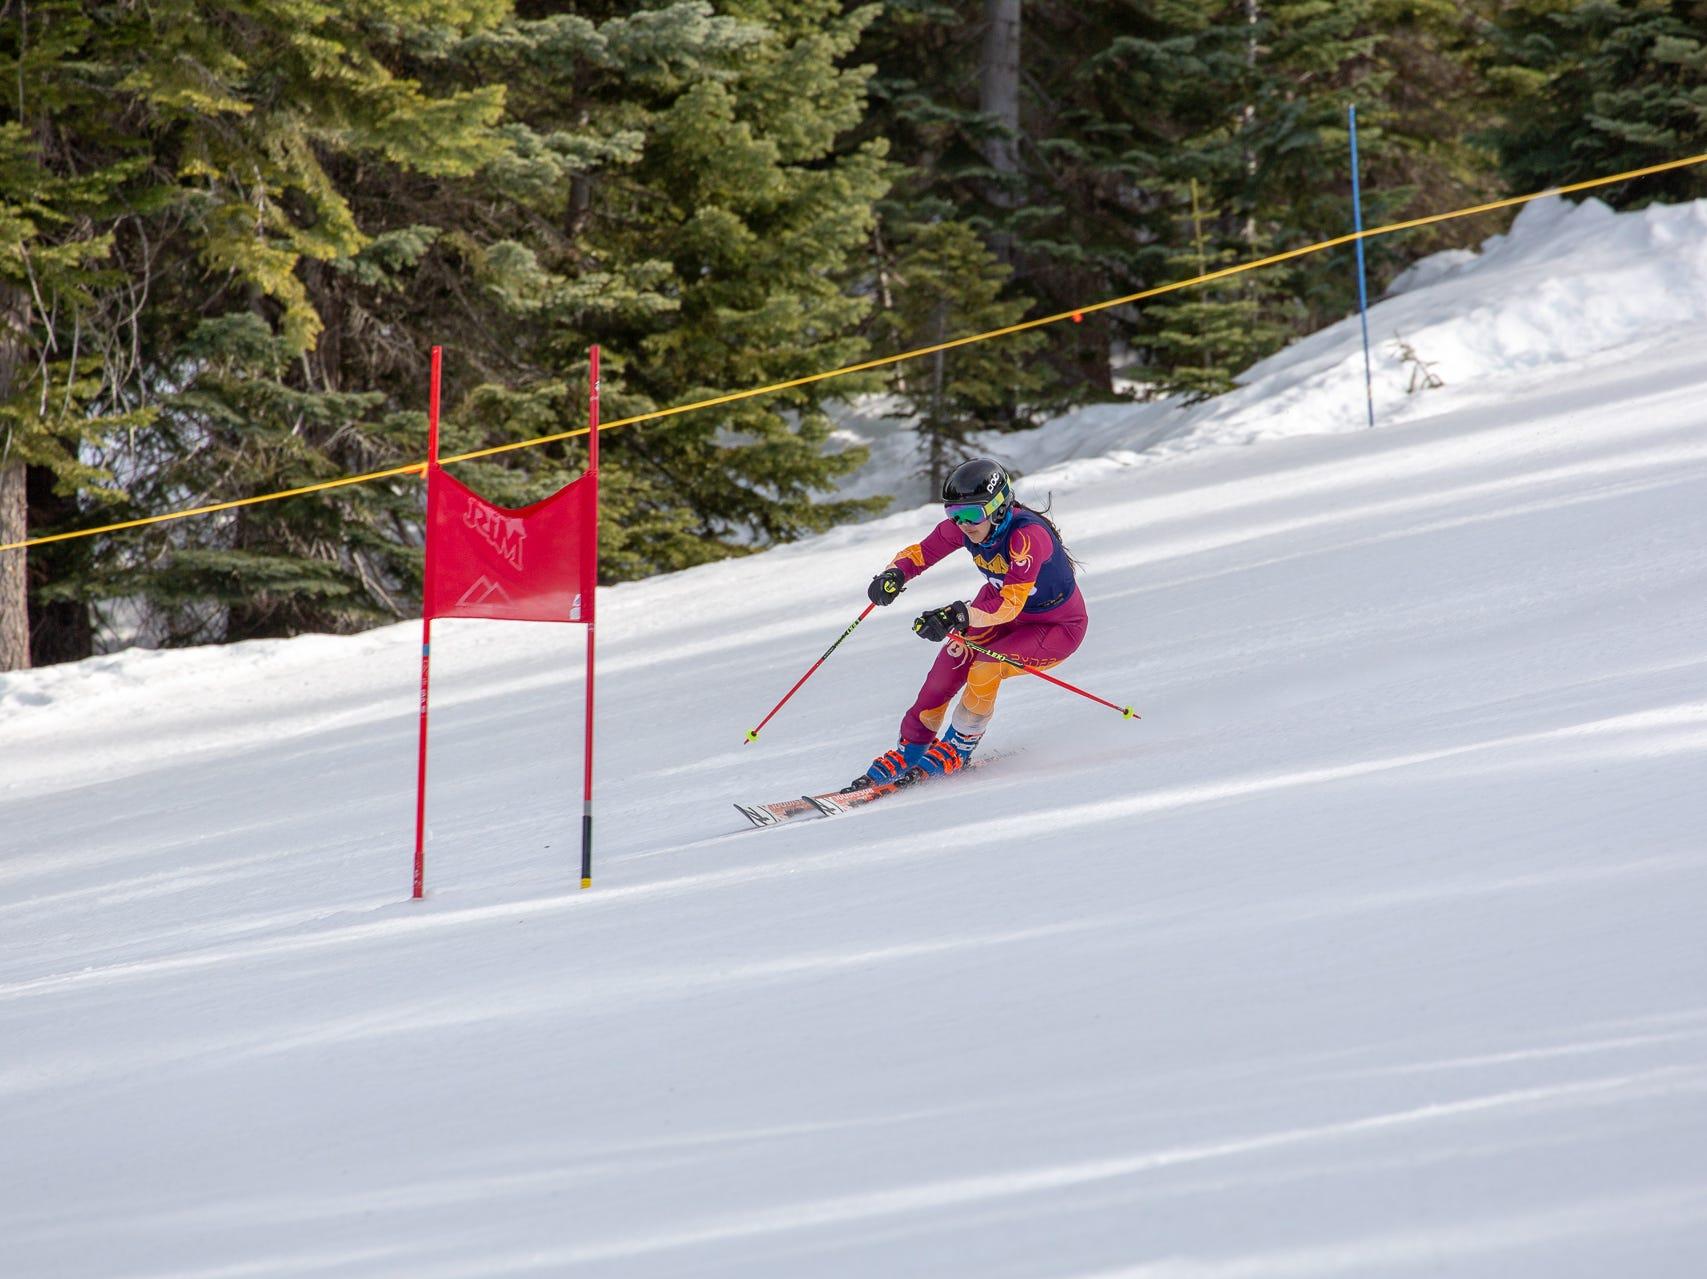 Zoe Malee of Mt. Shasta races in the third high school ski meet of 2019 on Monday, Jan. 28 at Mt. Shasta Ski Park.